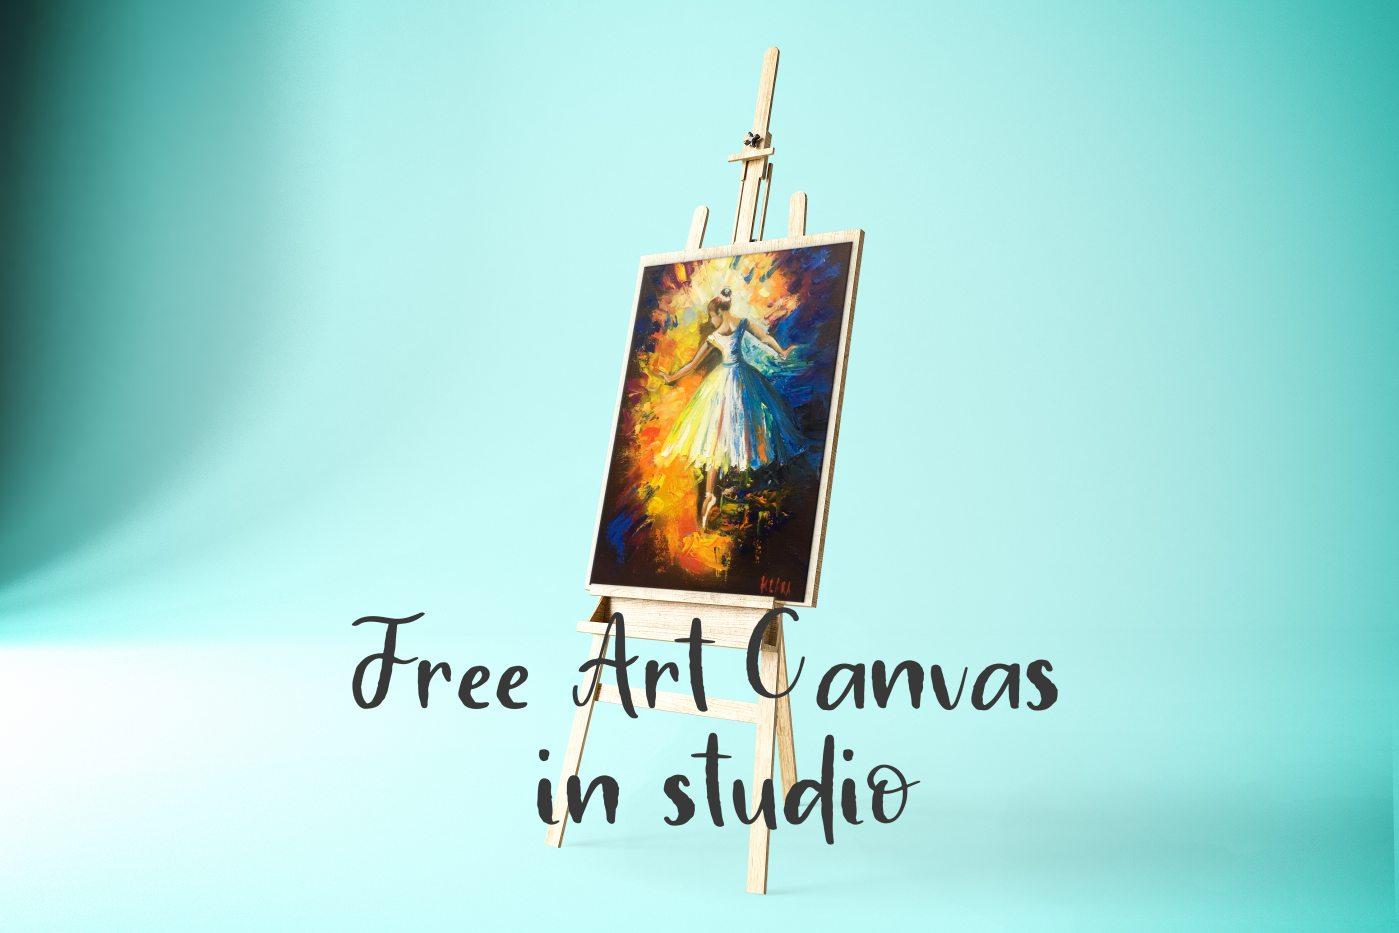 Free Art Canvas in studio Mockup PSD